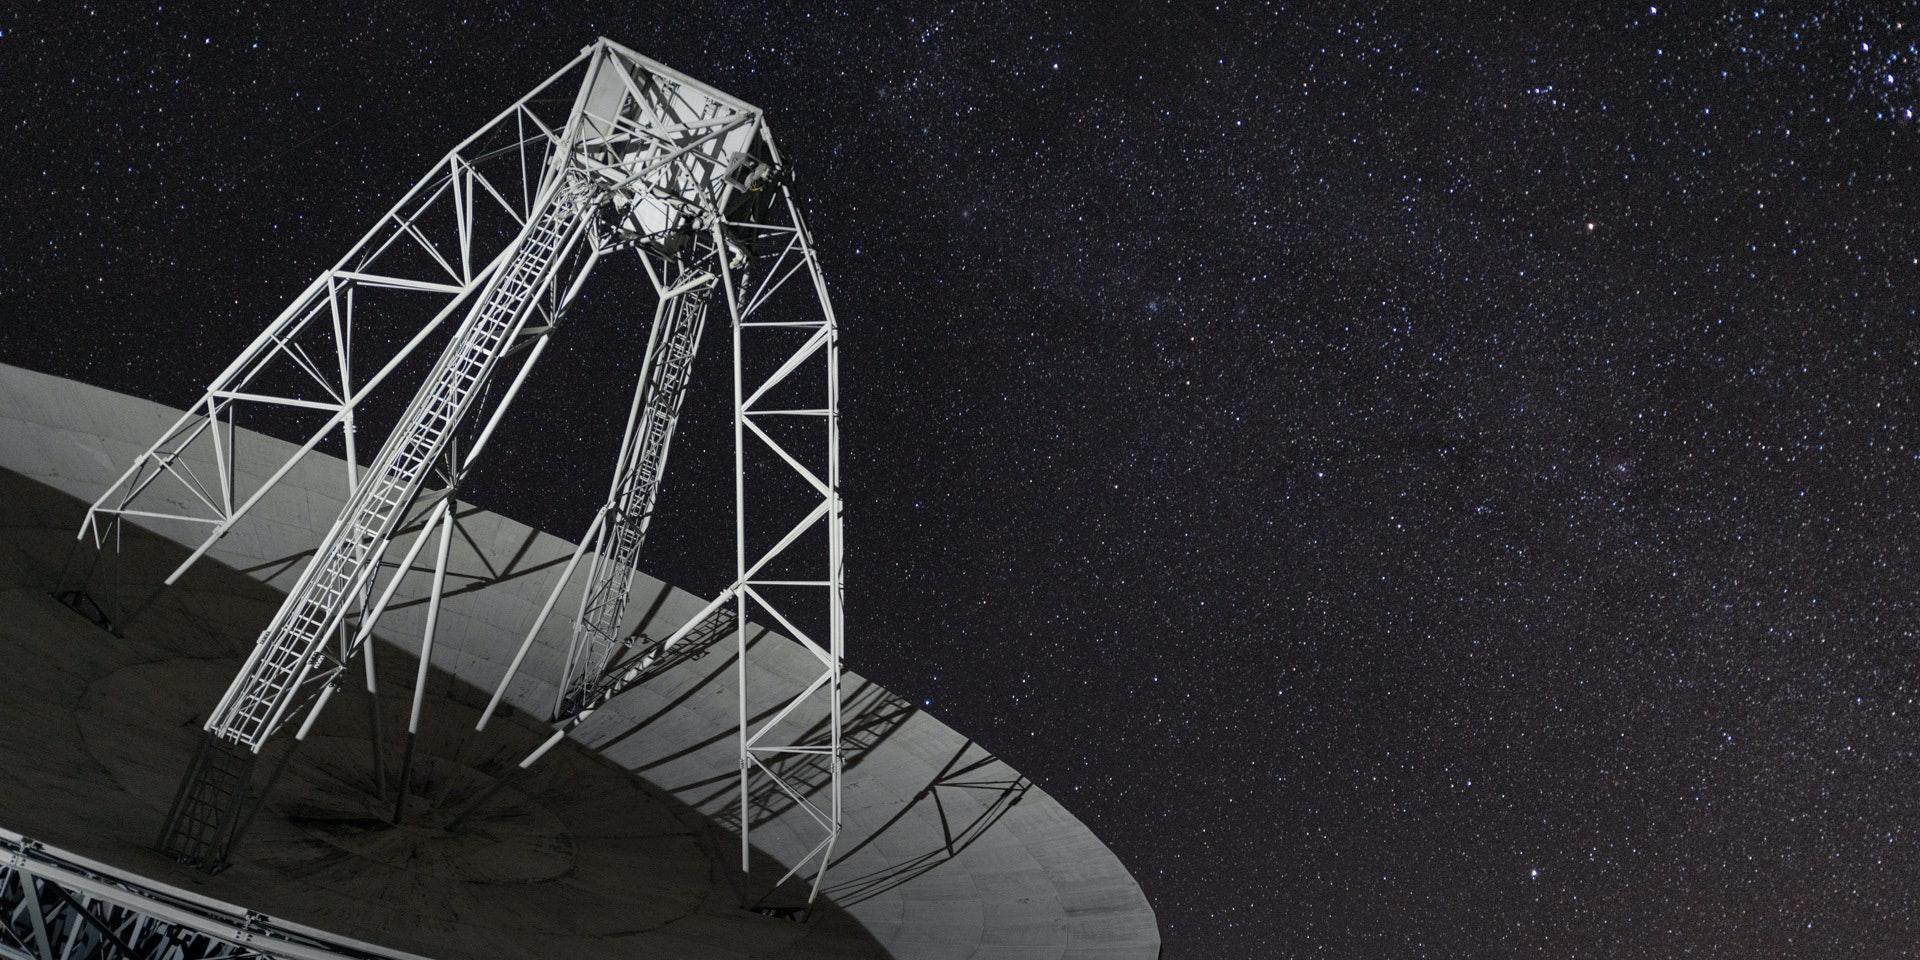 26 meter satellite dish, 26E, at the Pisgah Astronomical Research Institute in North Carolina.